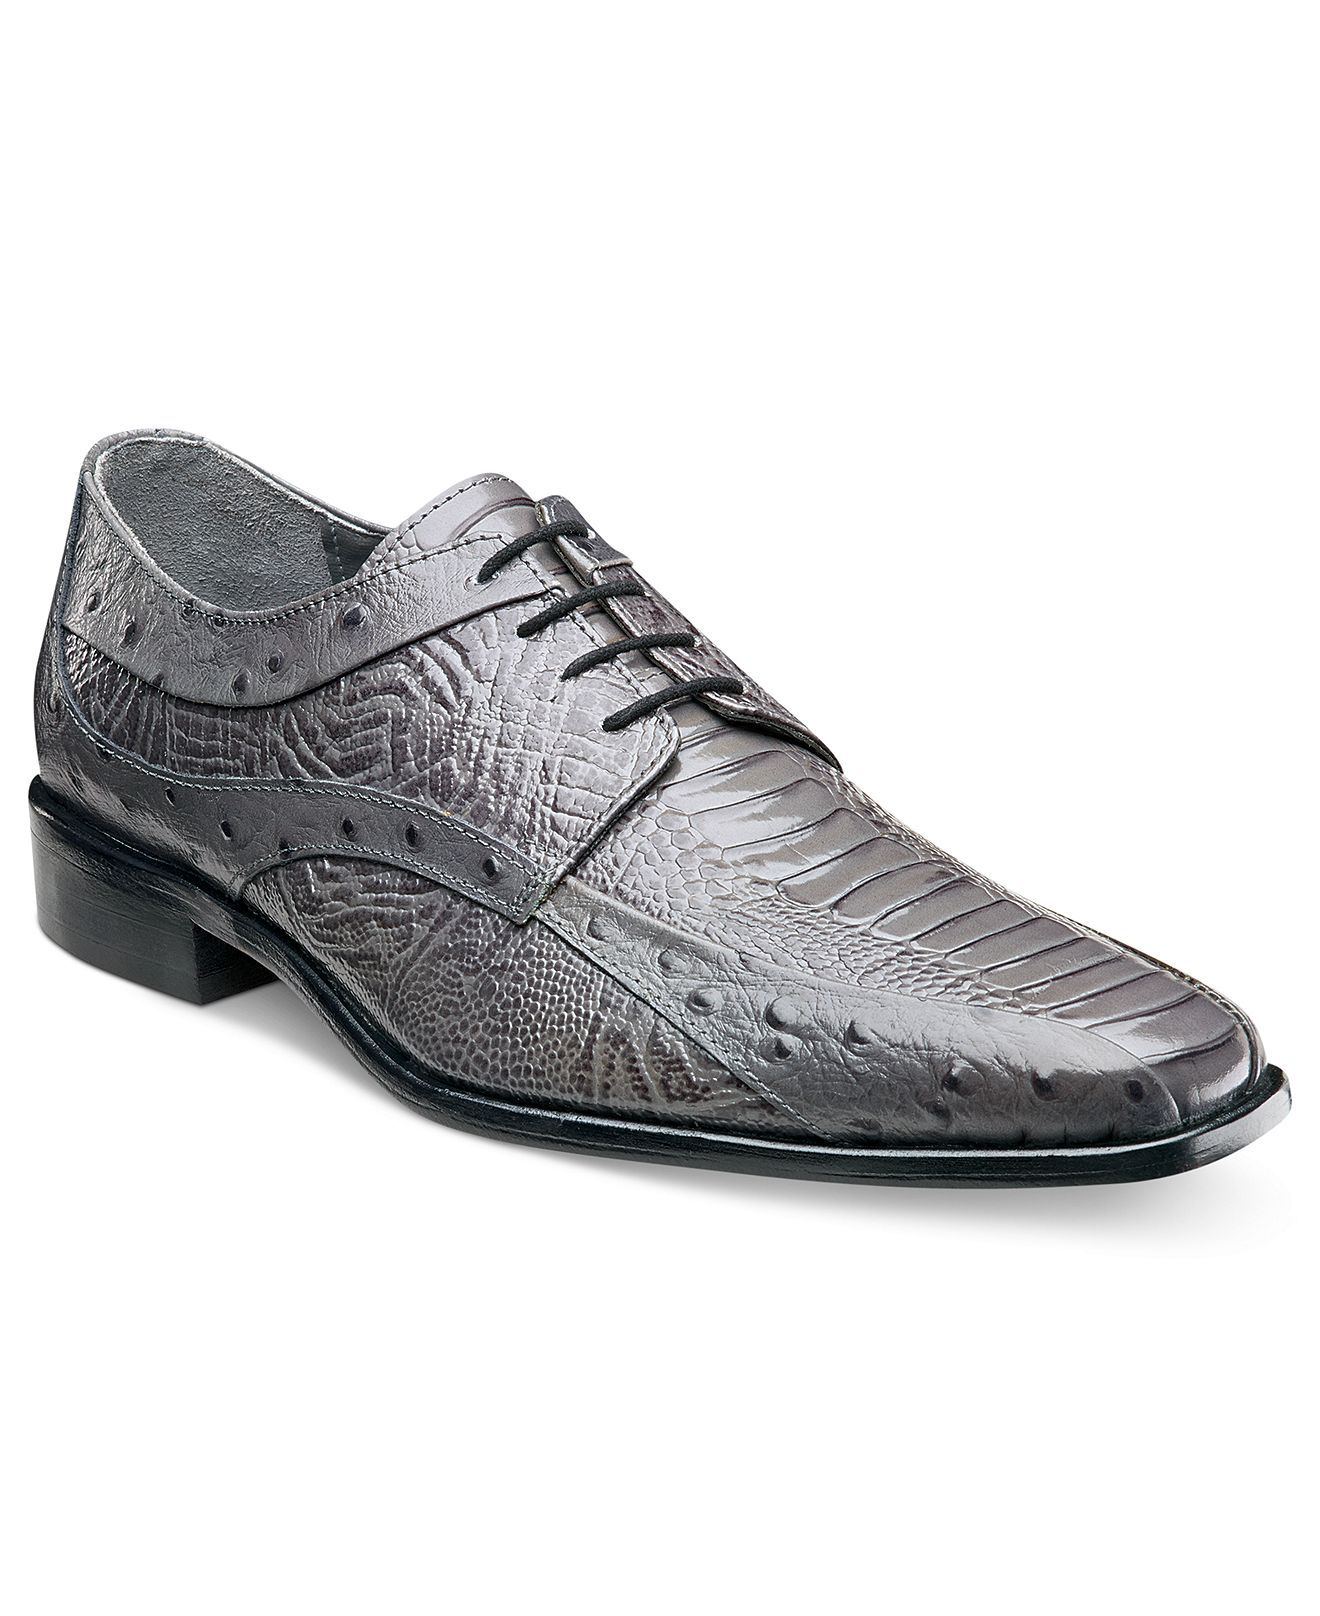 11edc227b93706 Stacy Adams Fiorenza Ostrich Print Lace-Up Shoes - All Men s Shoes - Men -  Macy s